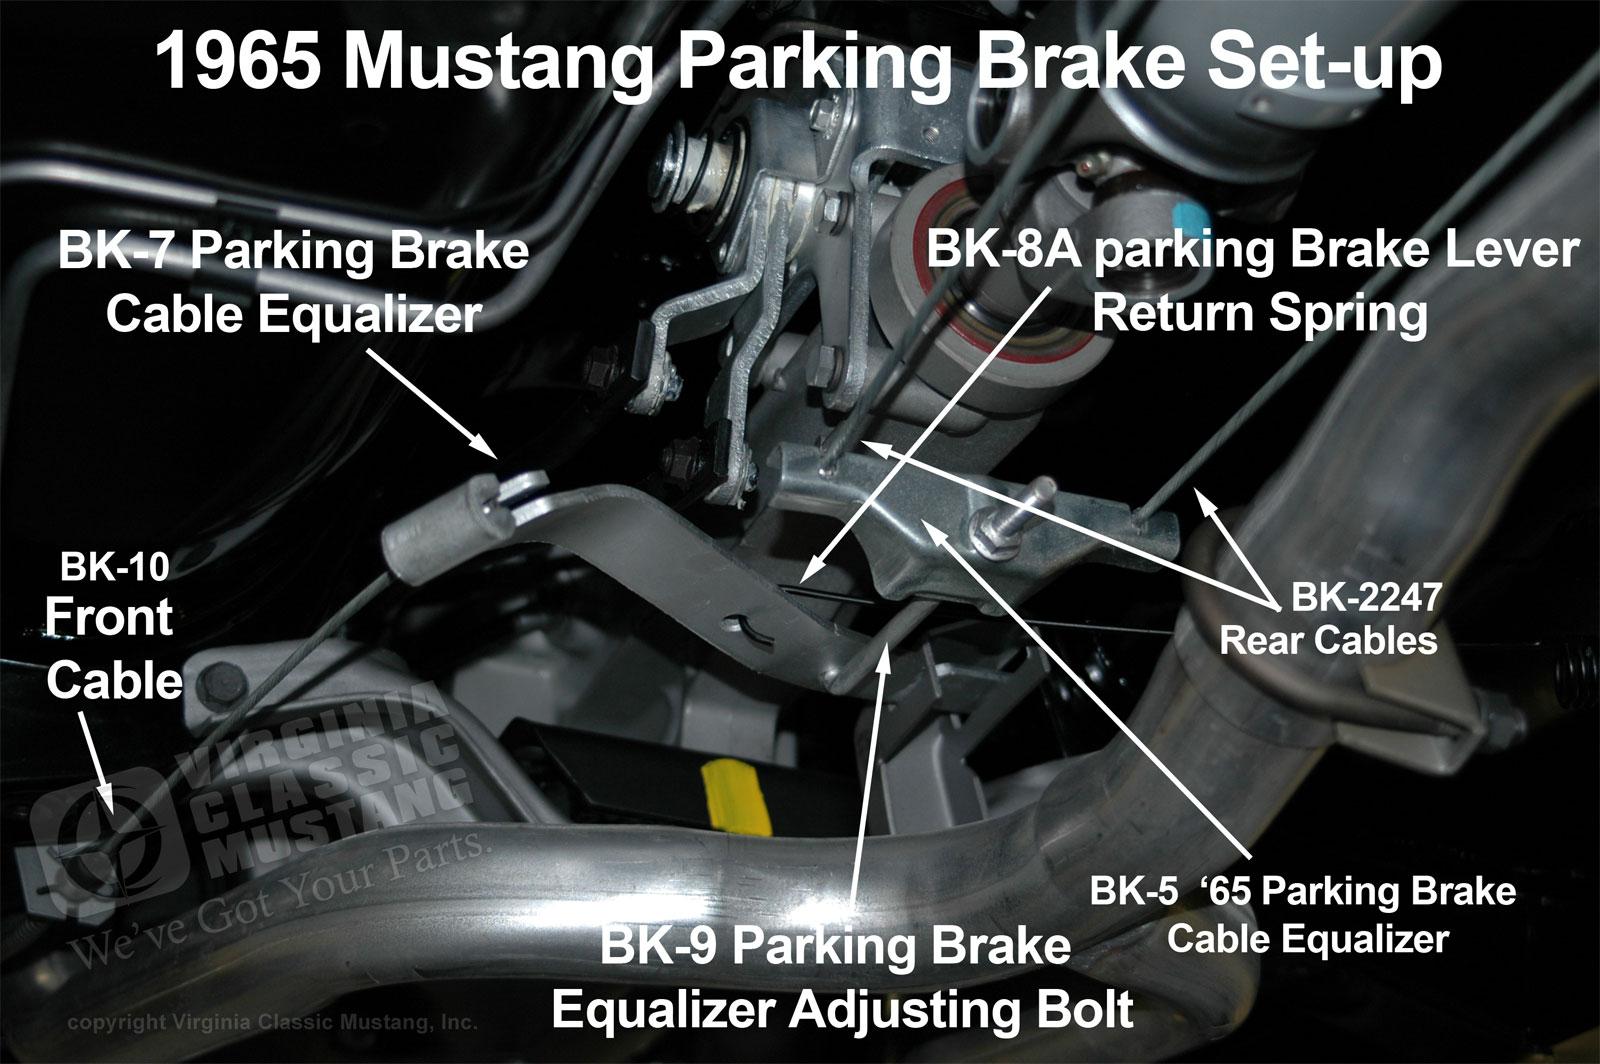 medium resolution of 1965 mustang parking brake set up